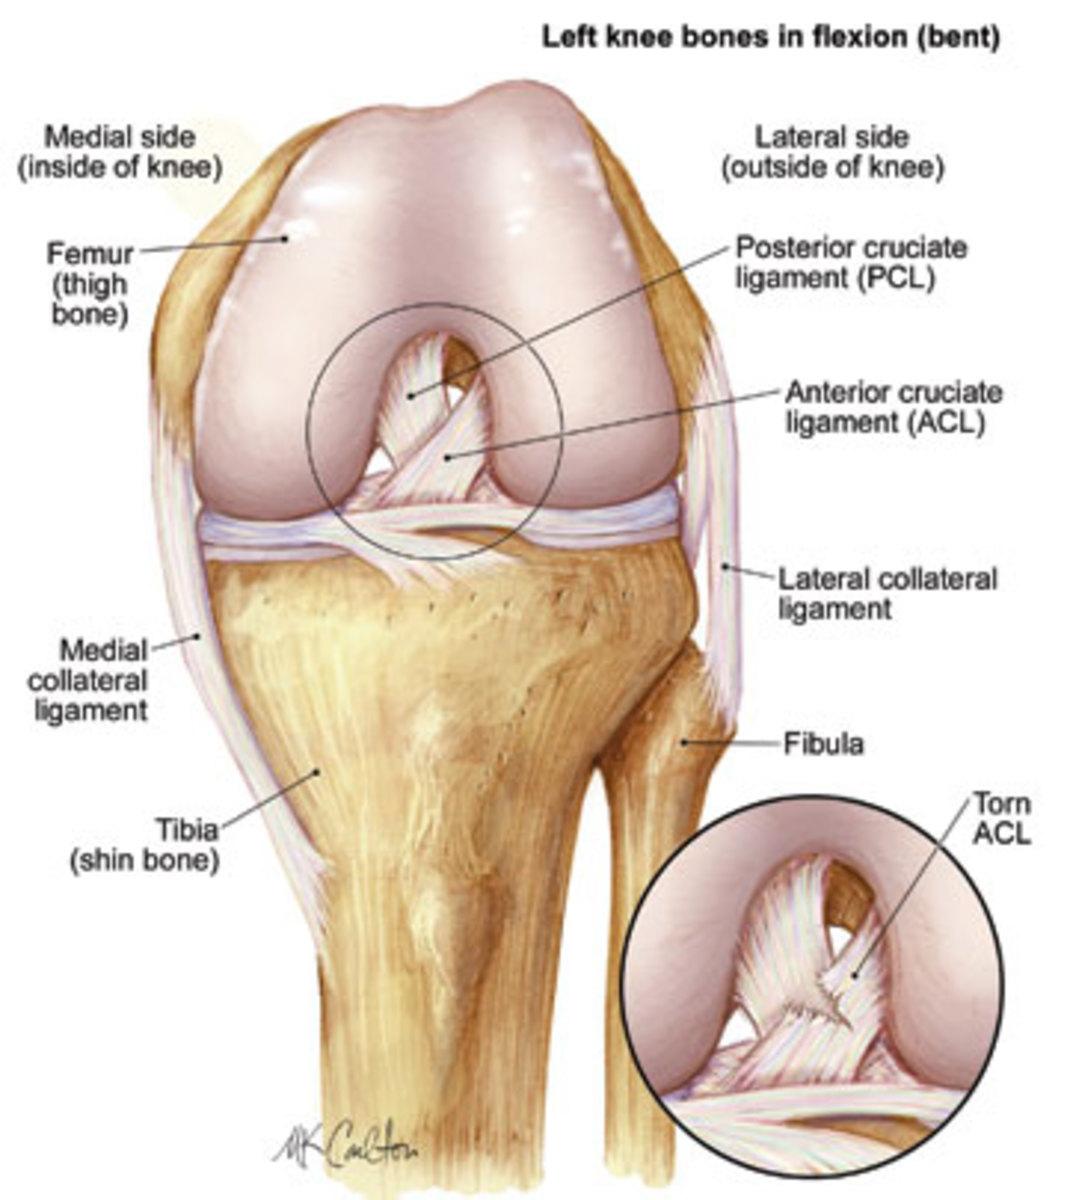 The anatomy of the knee.